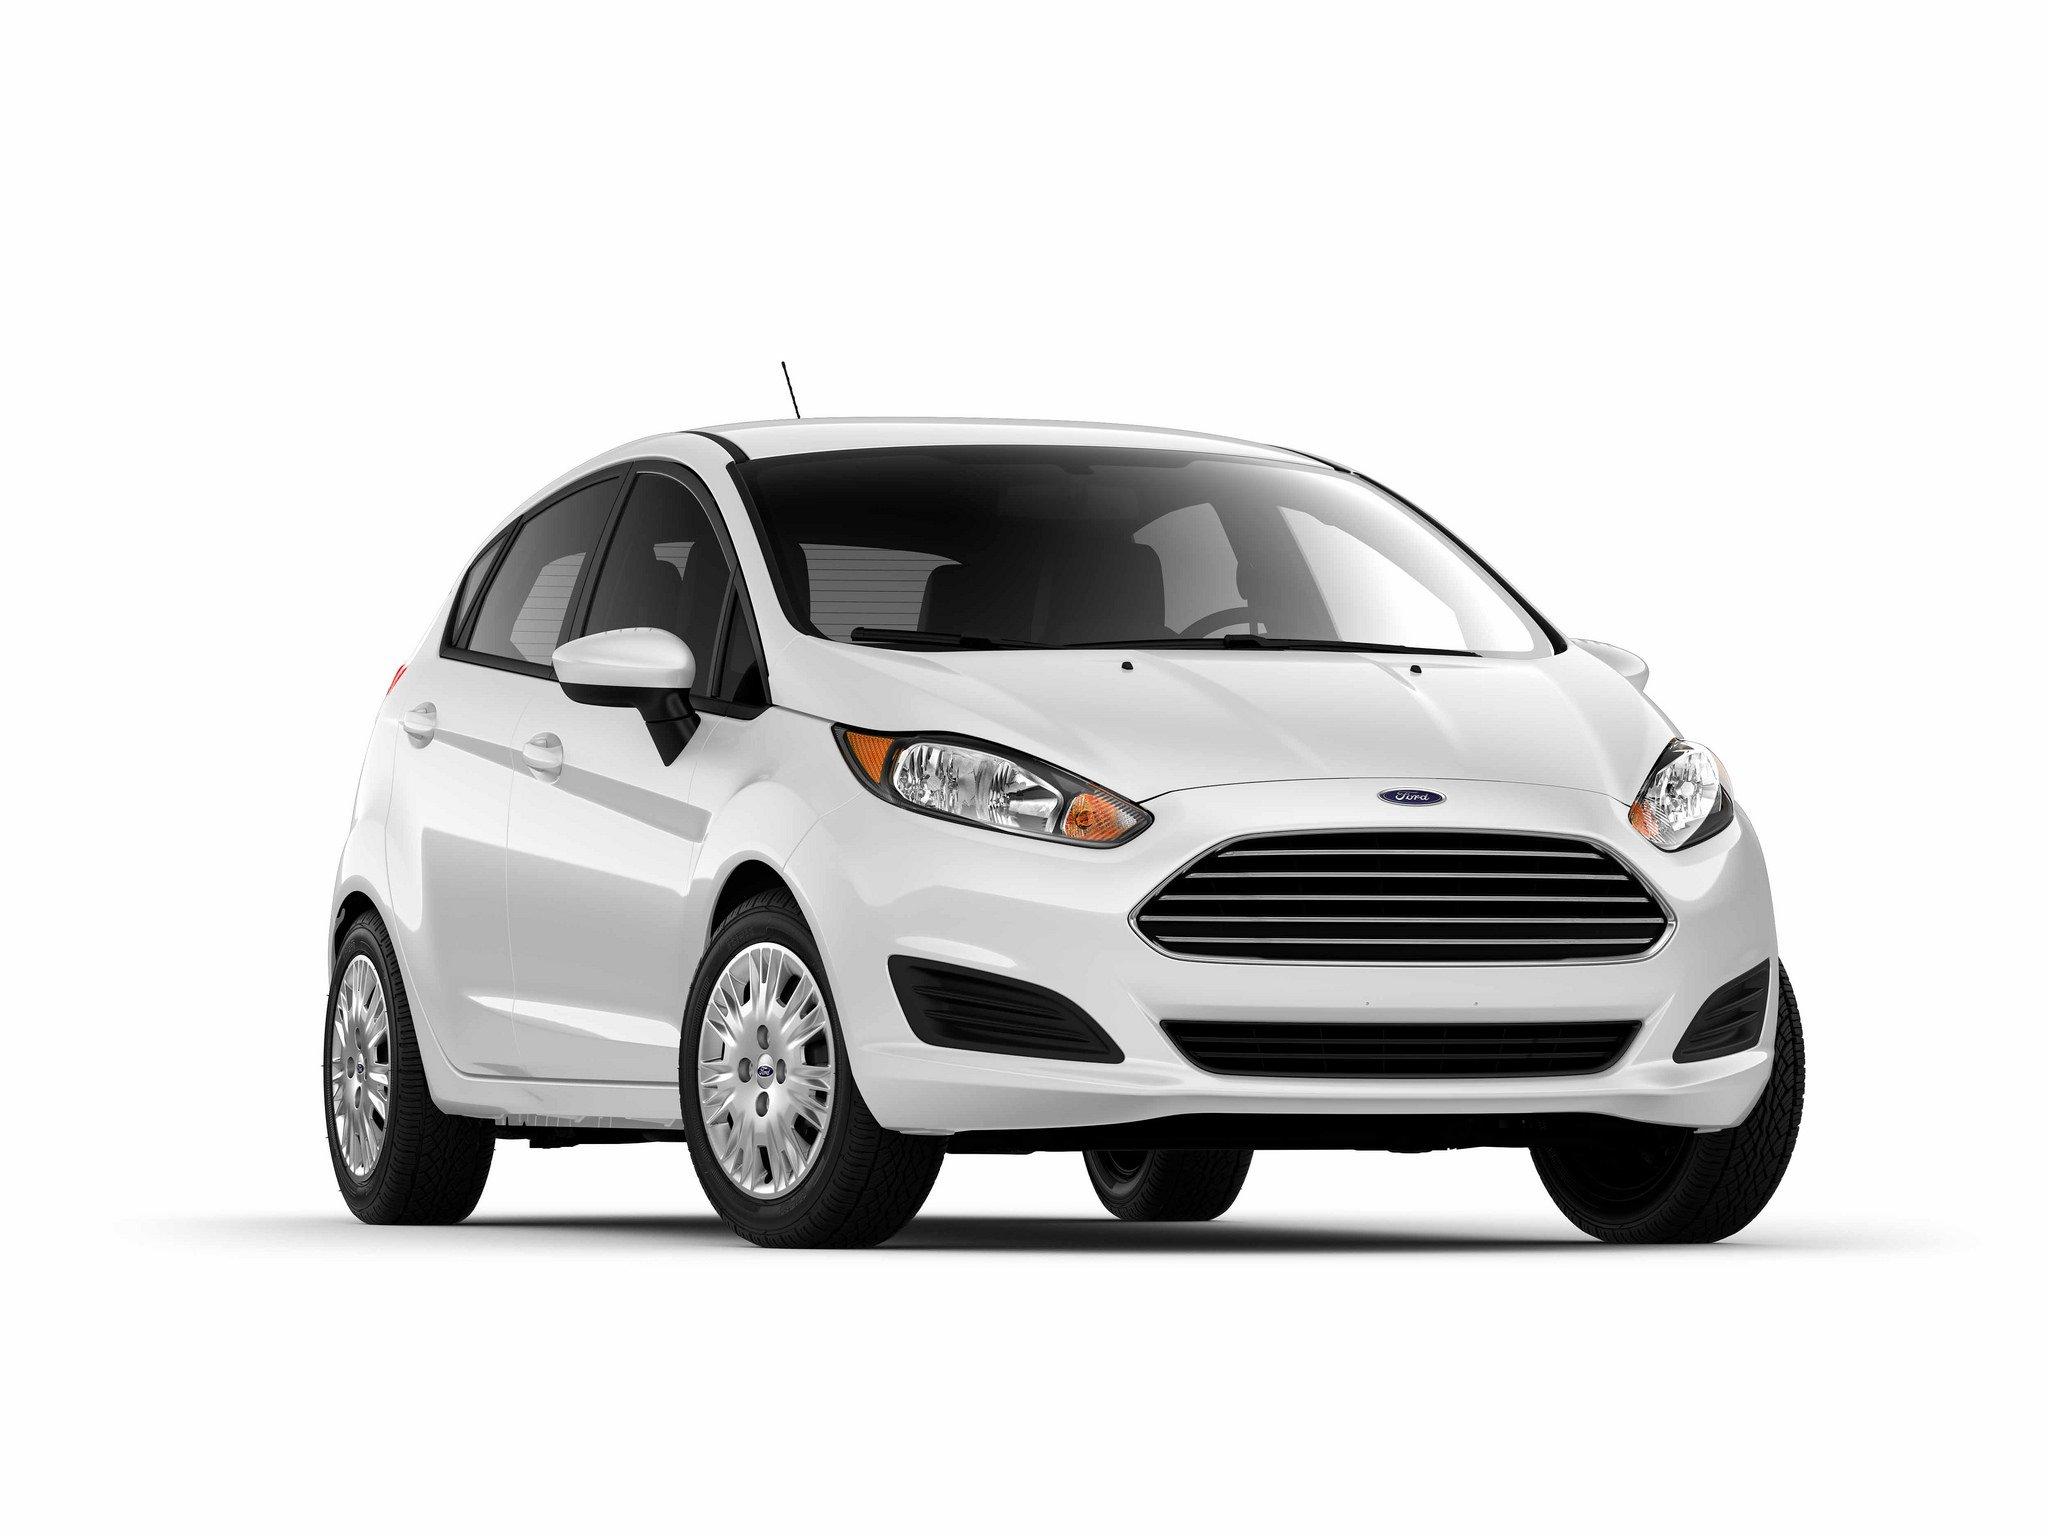 2015 Ford Fiesta White.jpg